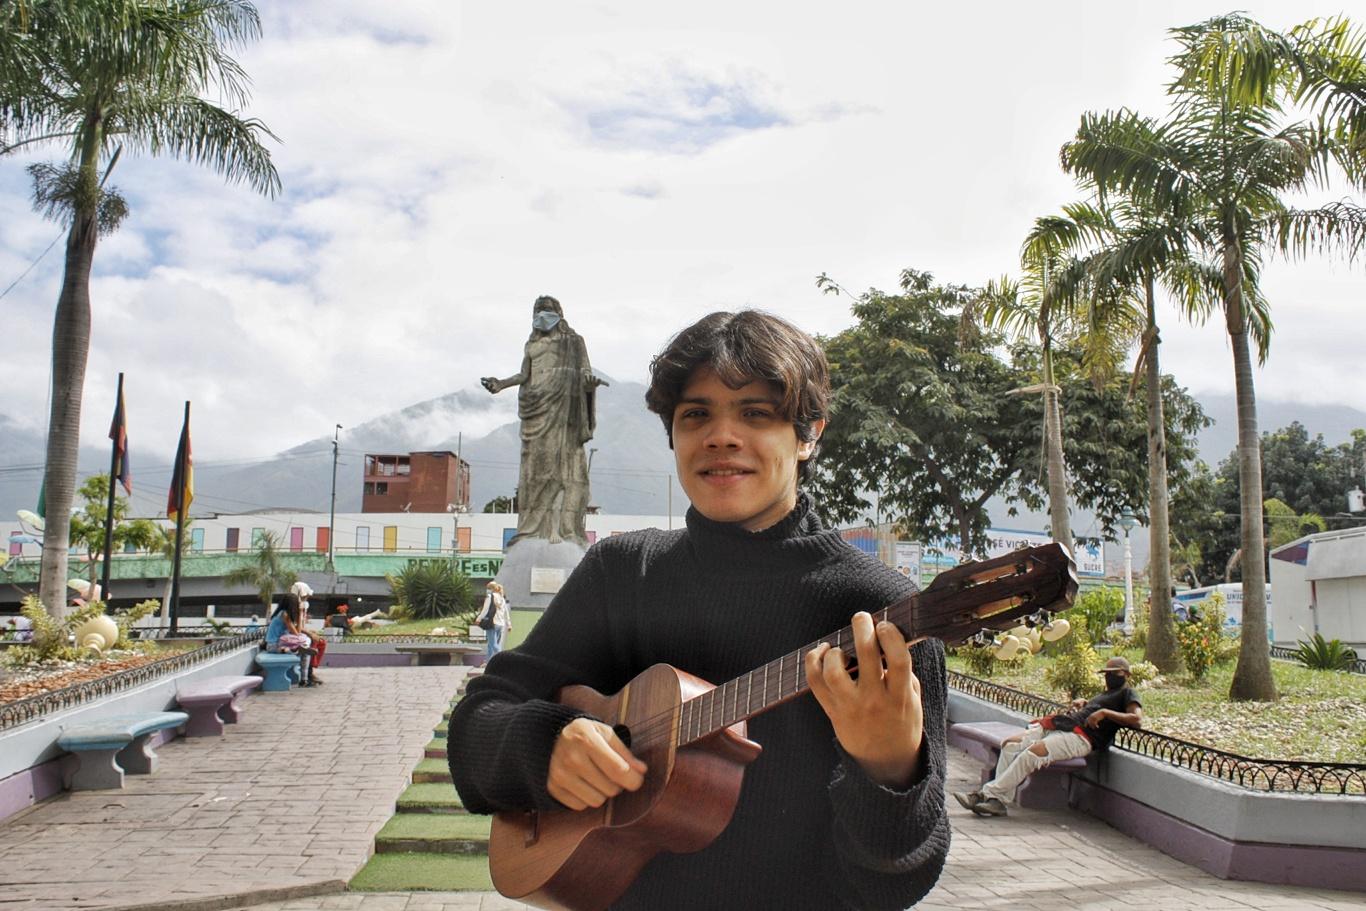 Caracas joven